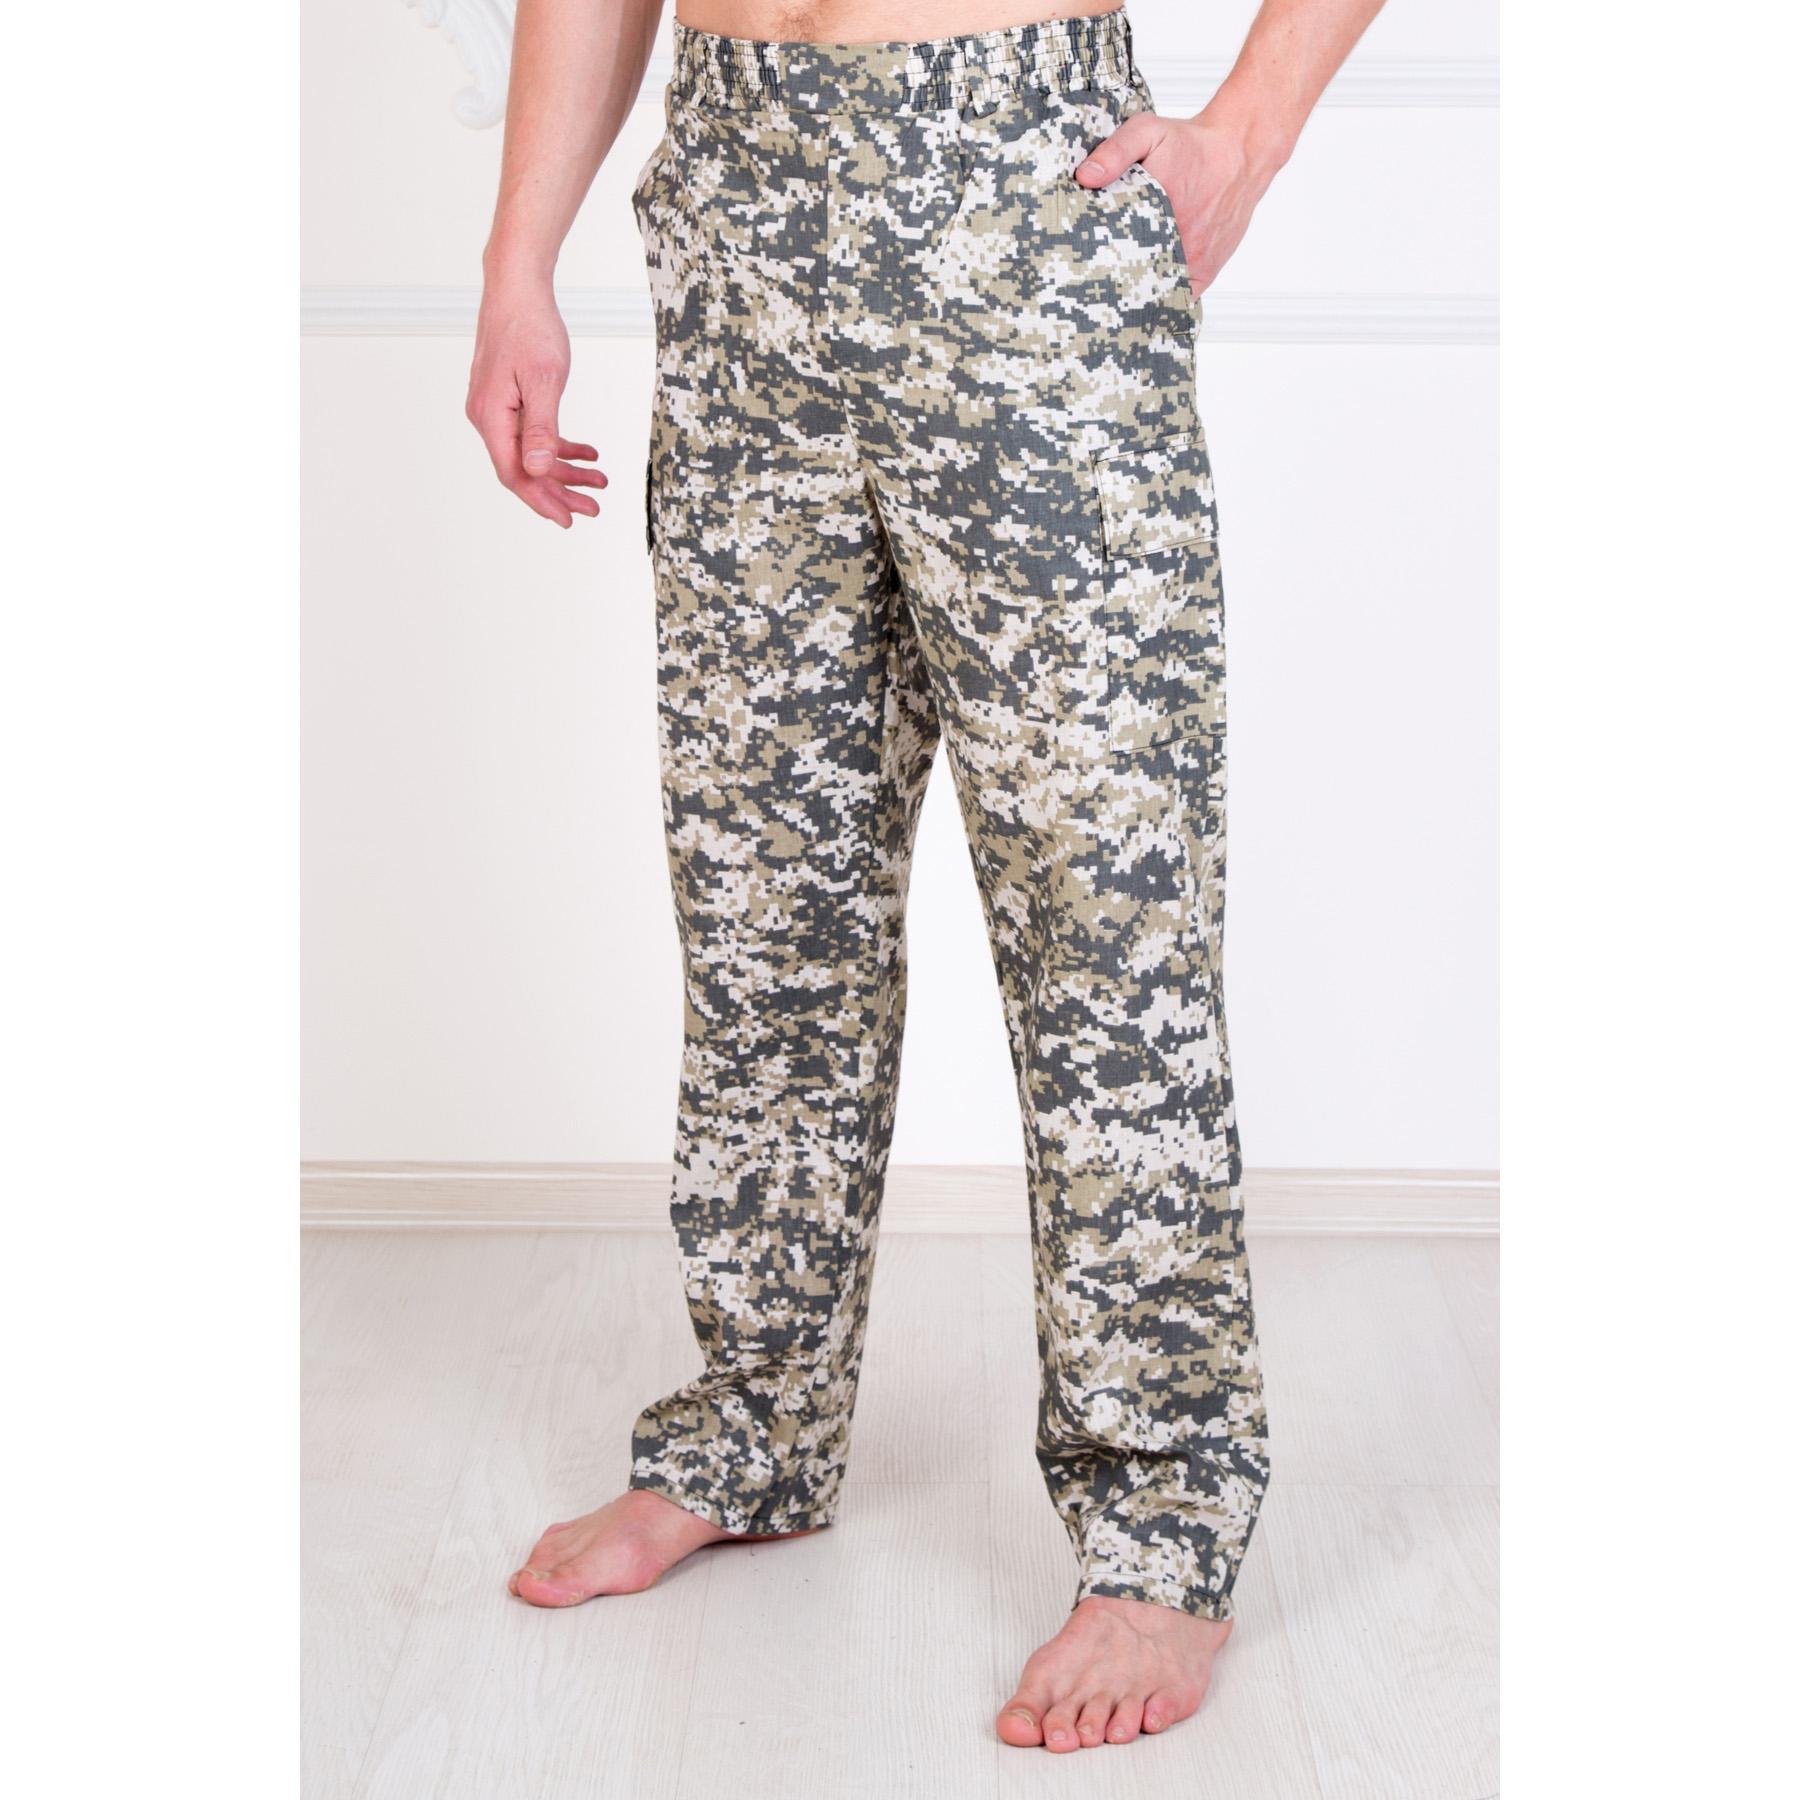 Мужские брюки «Перевал», размер 46Спецодежда<br><br><br>Тип: Муж. брюки<br>Размер: 46<br>Материал: Рип-стоп